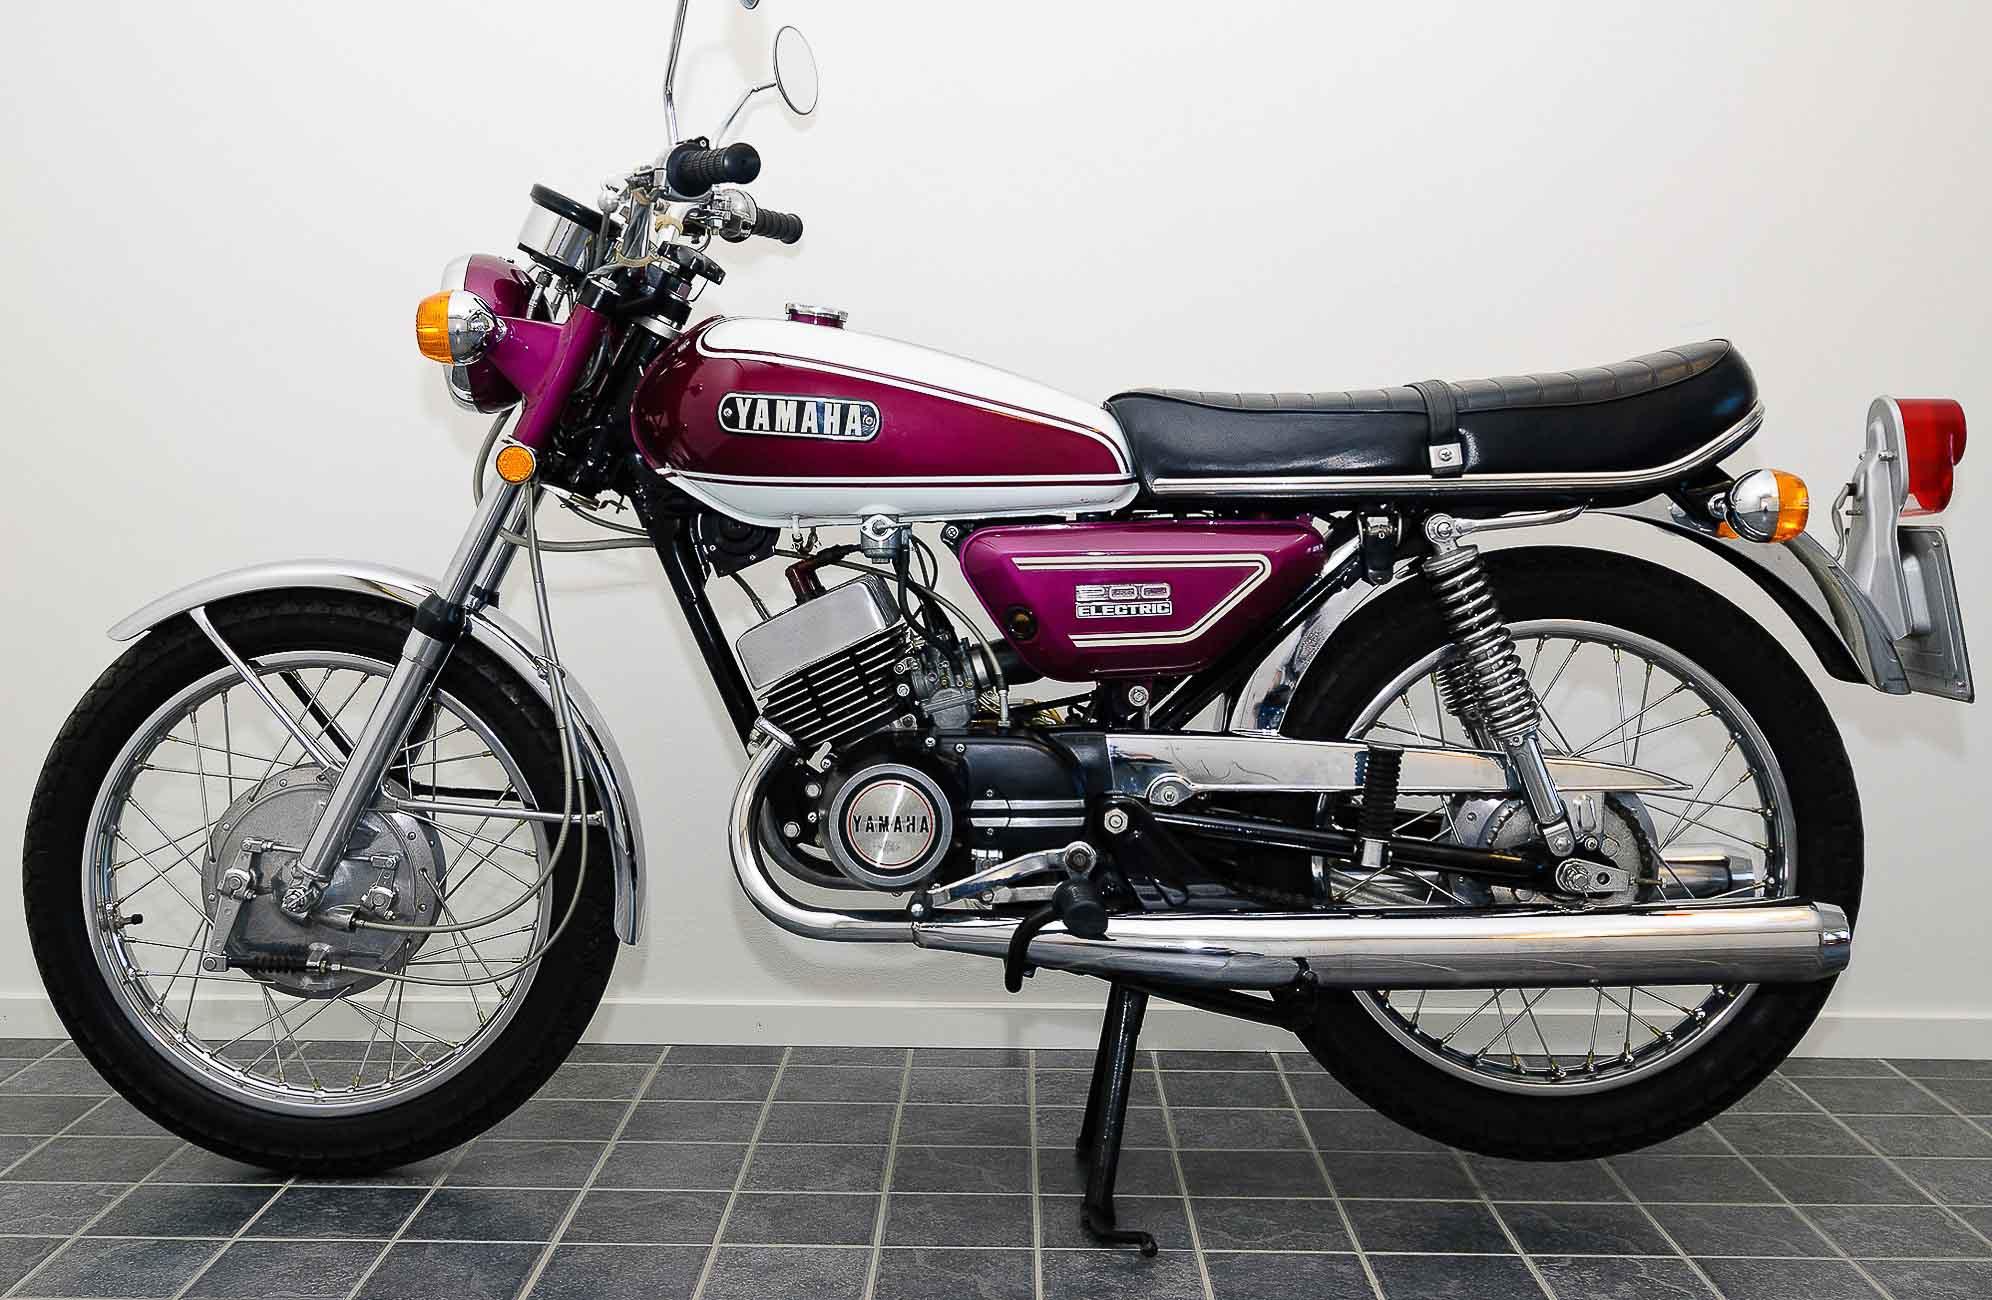 YAMAHA CS1 - CS5 (1967 - 1972)